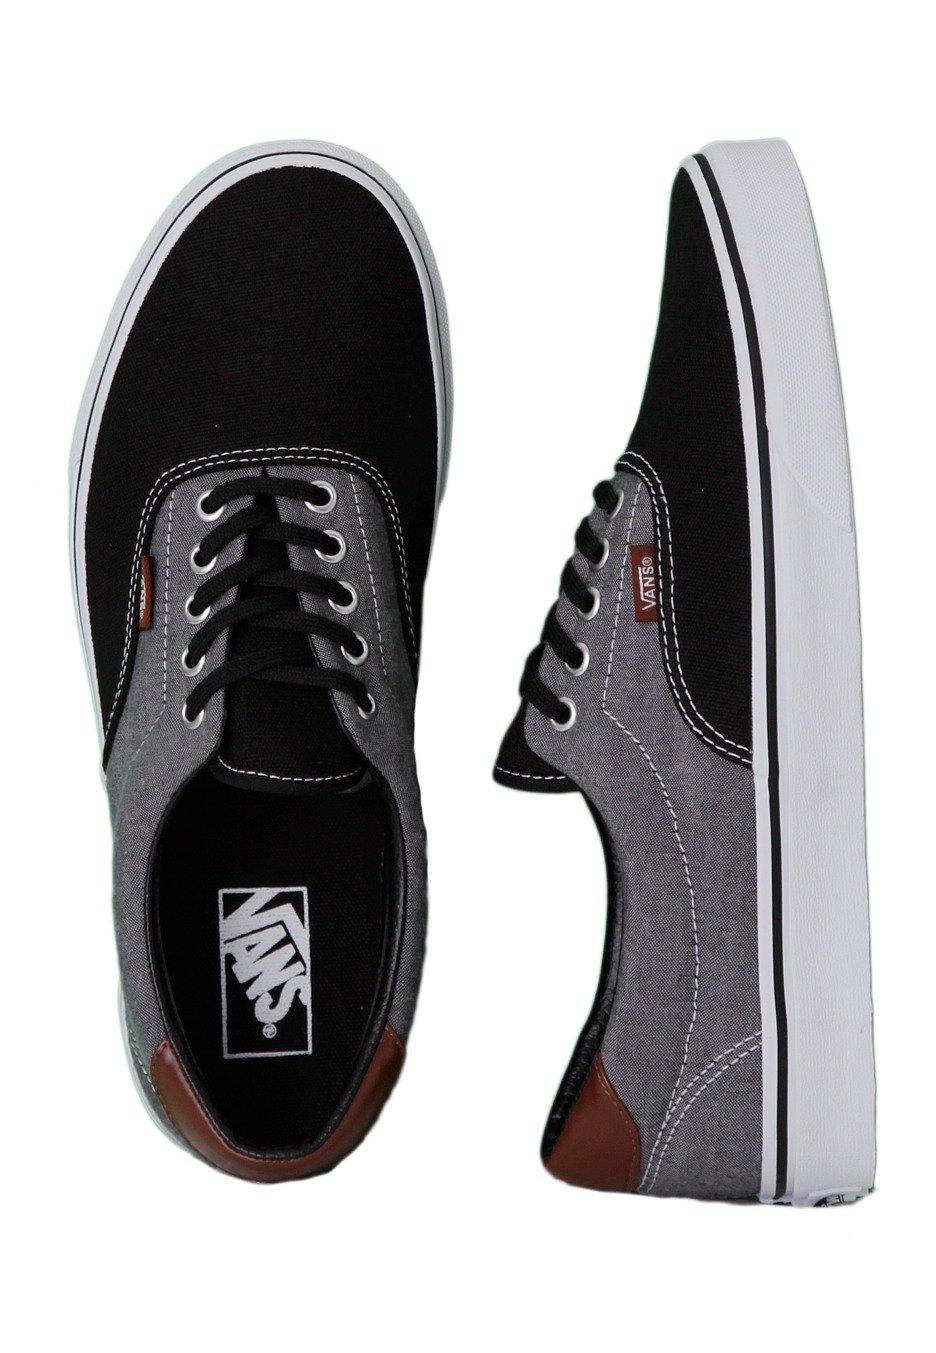 1af3ebf84a6f Vans - Era 59 Canvas   Chambray - Shoes - Impericon.com UK